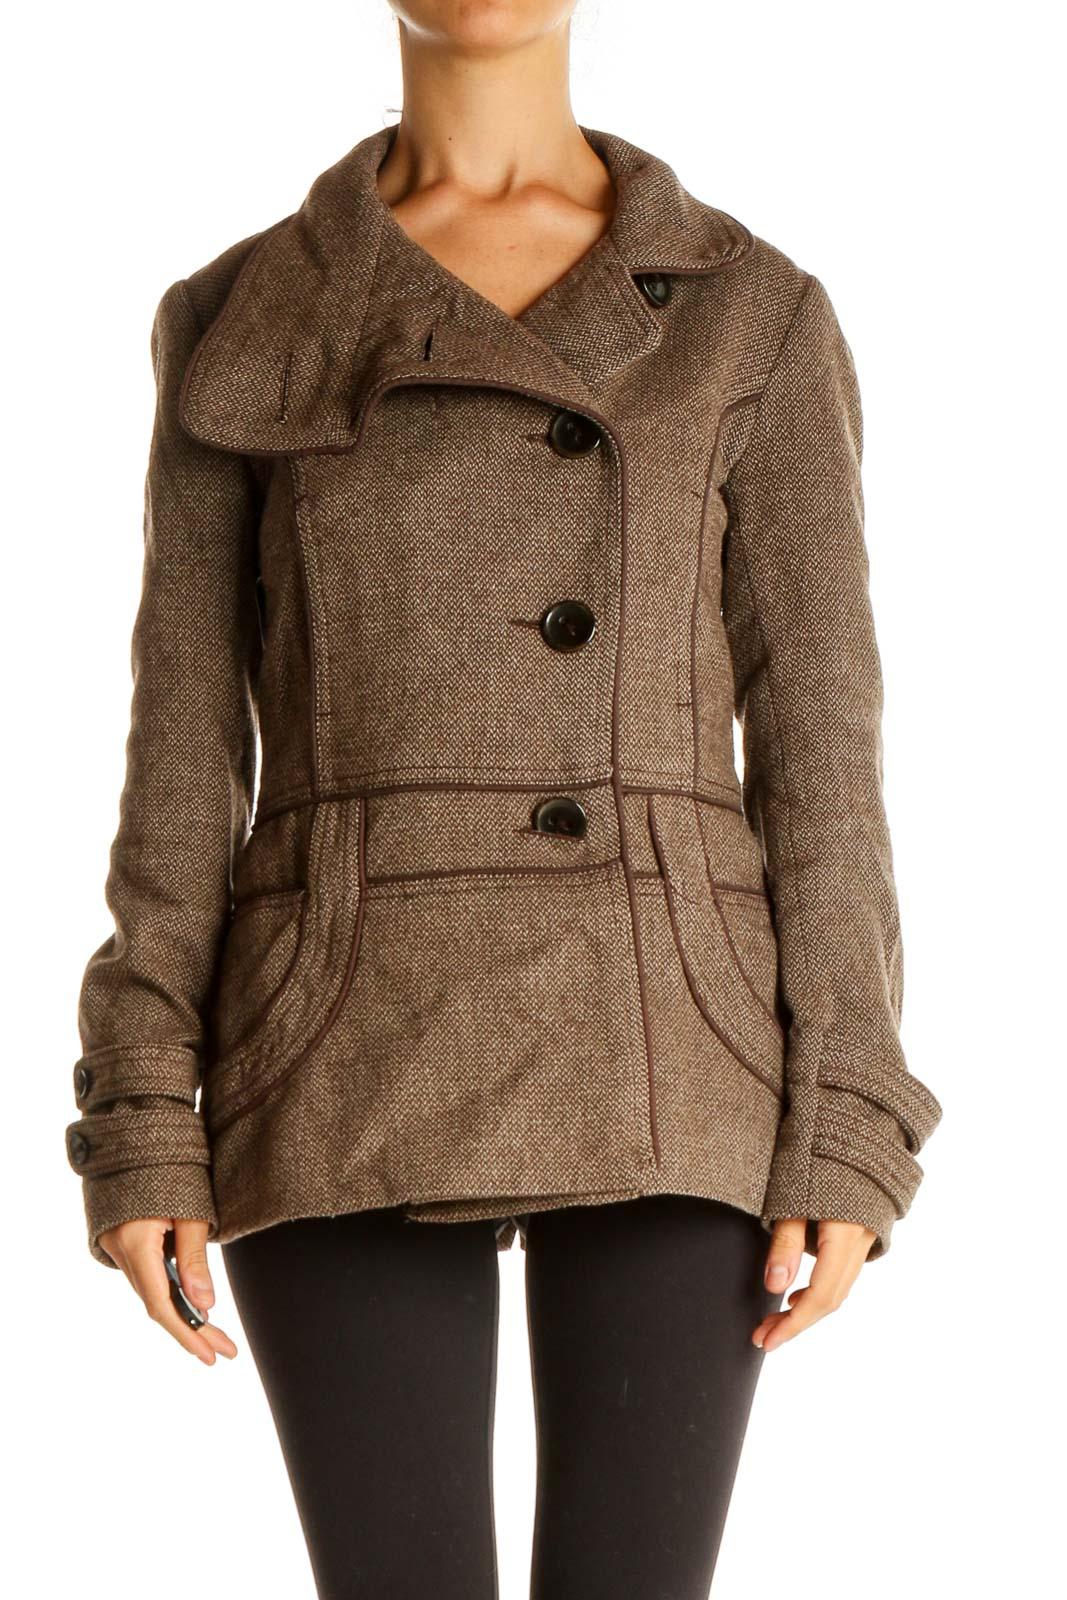 Brown Jacket Front